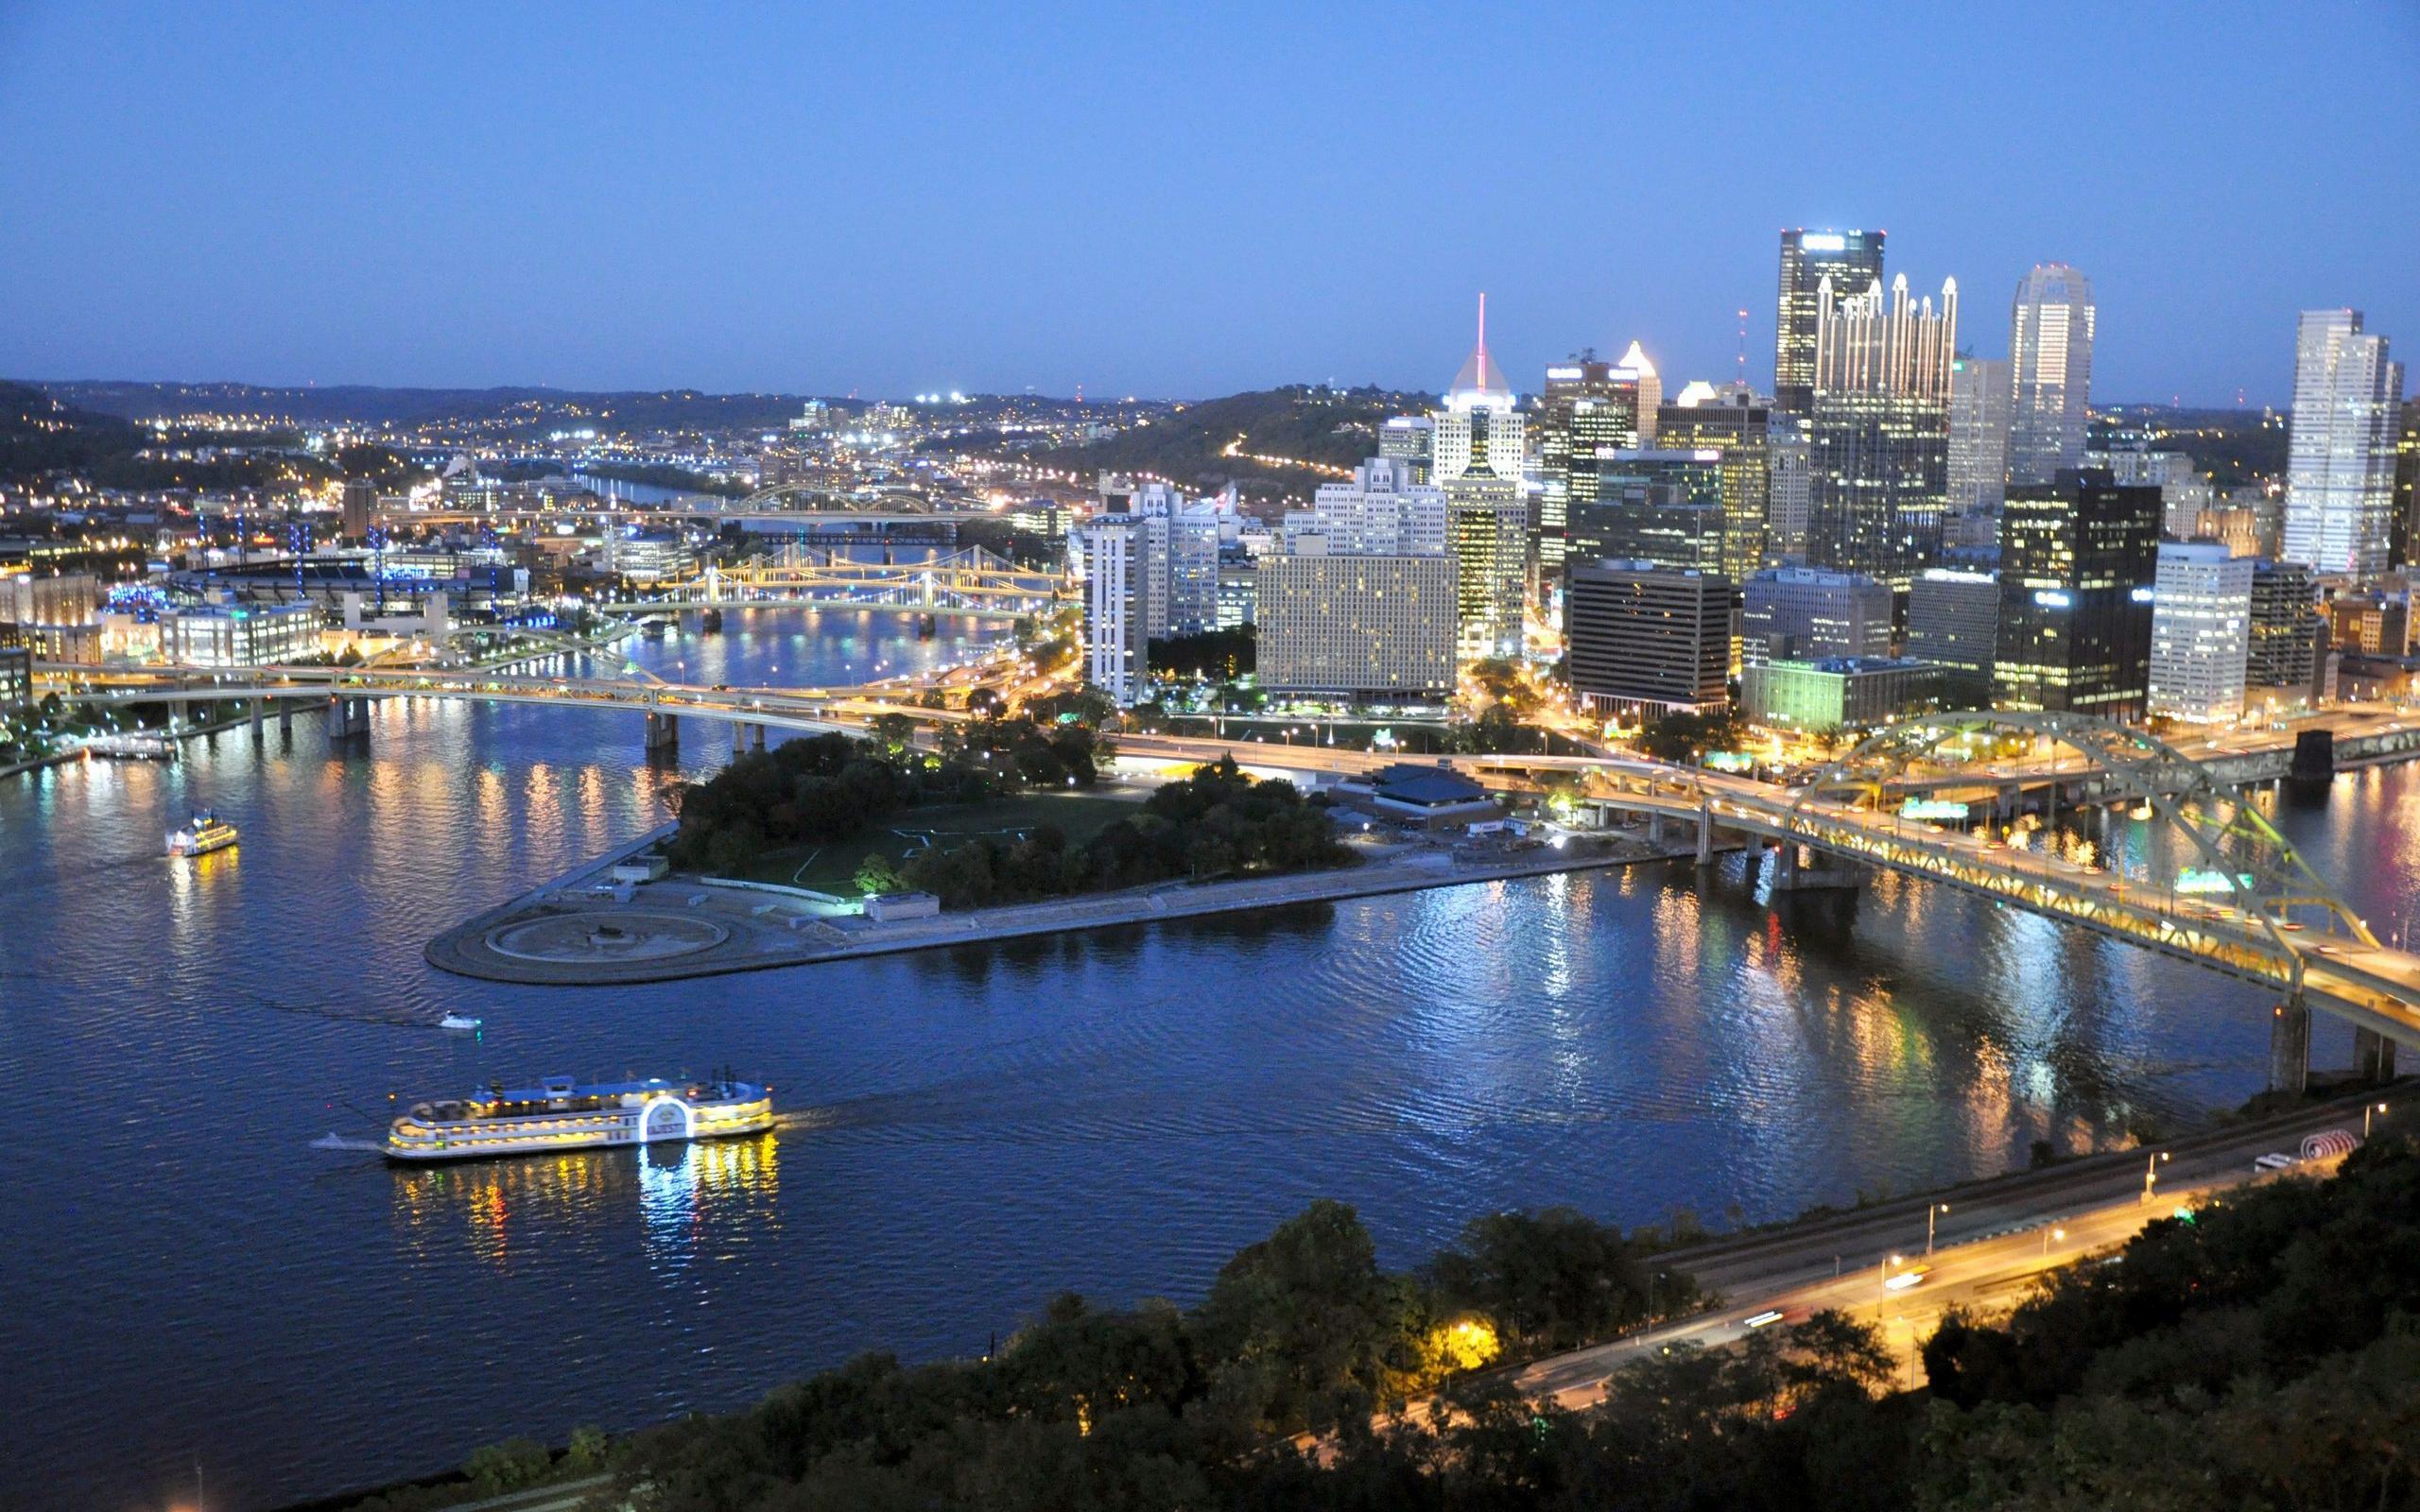 Pittsburgh At Twilight 2560x1600 926 HD Wallpaper Res 2560x1600 2560x1600